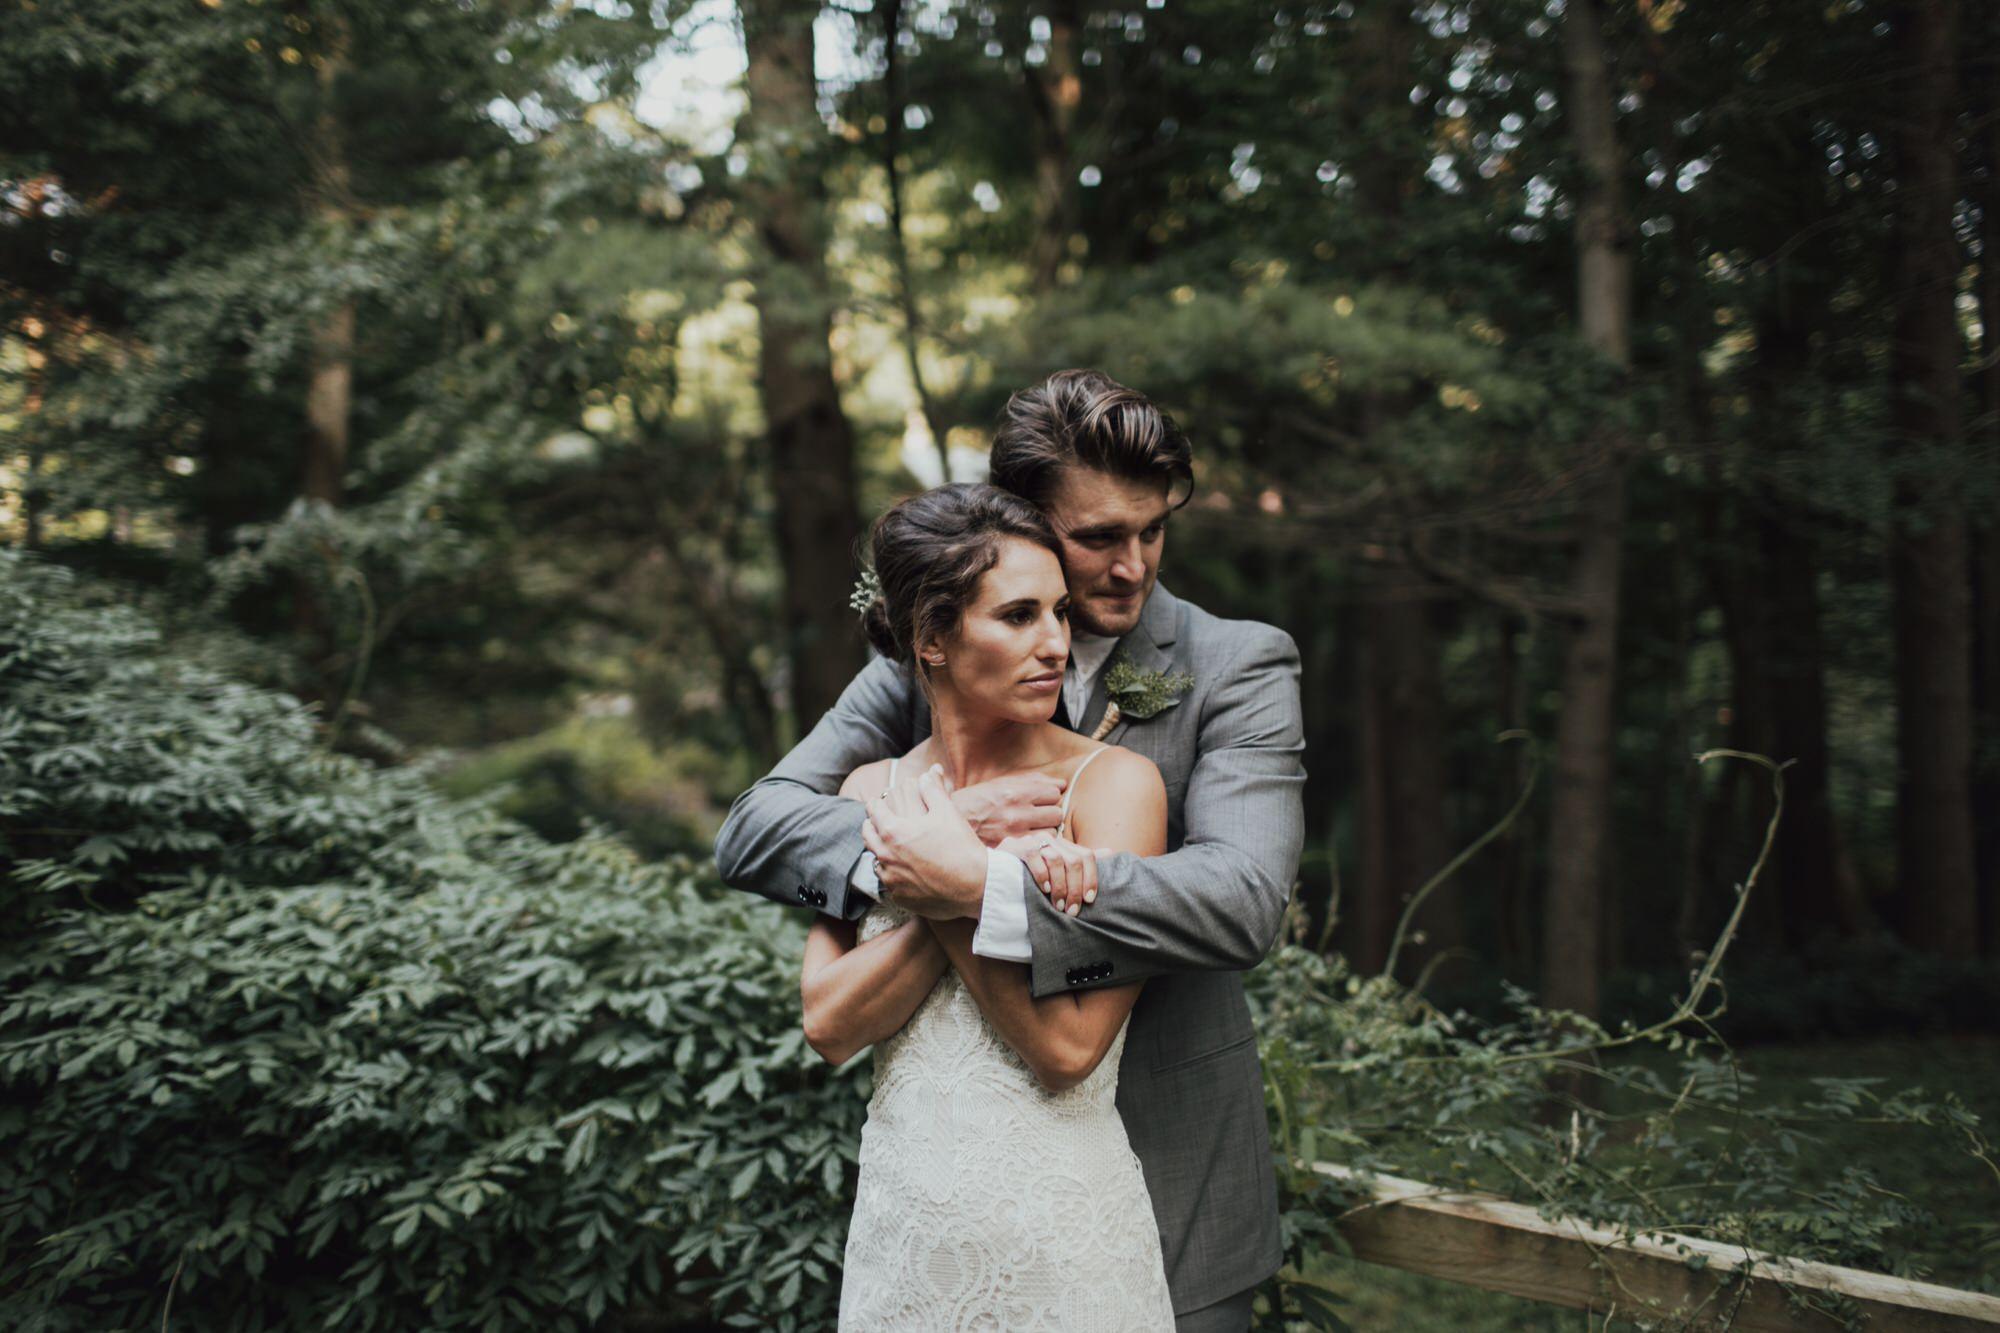 emily-aaron-rochester-new-york-wedding-photographer-98.JPG